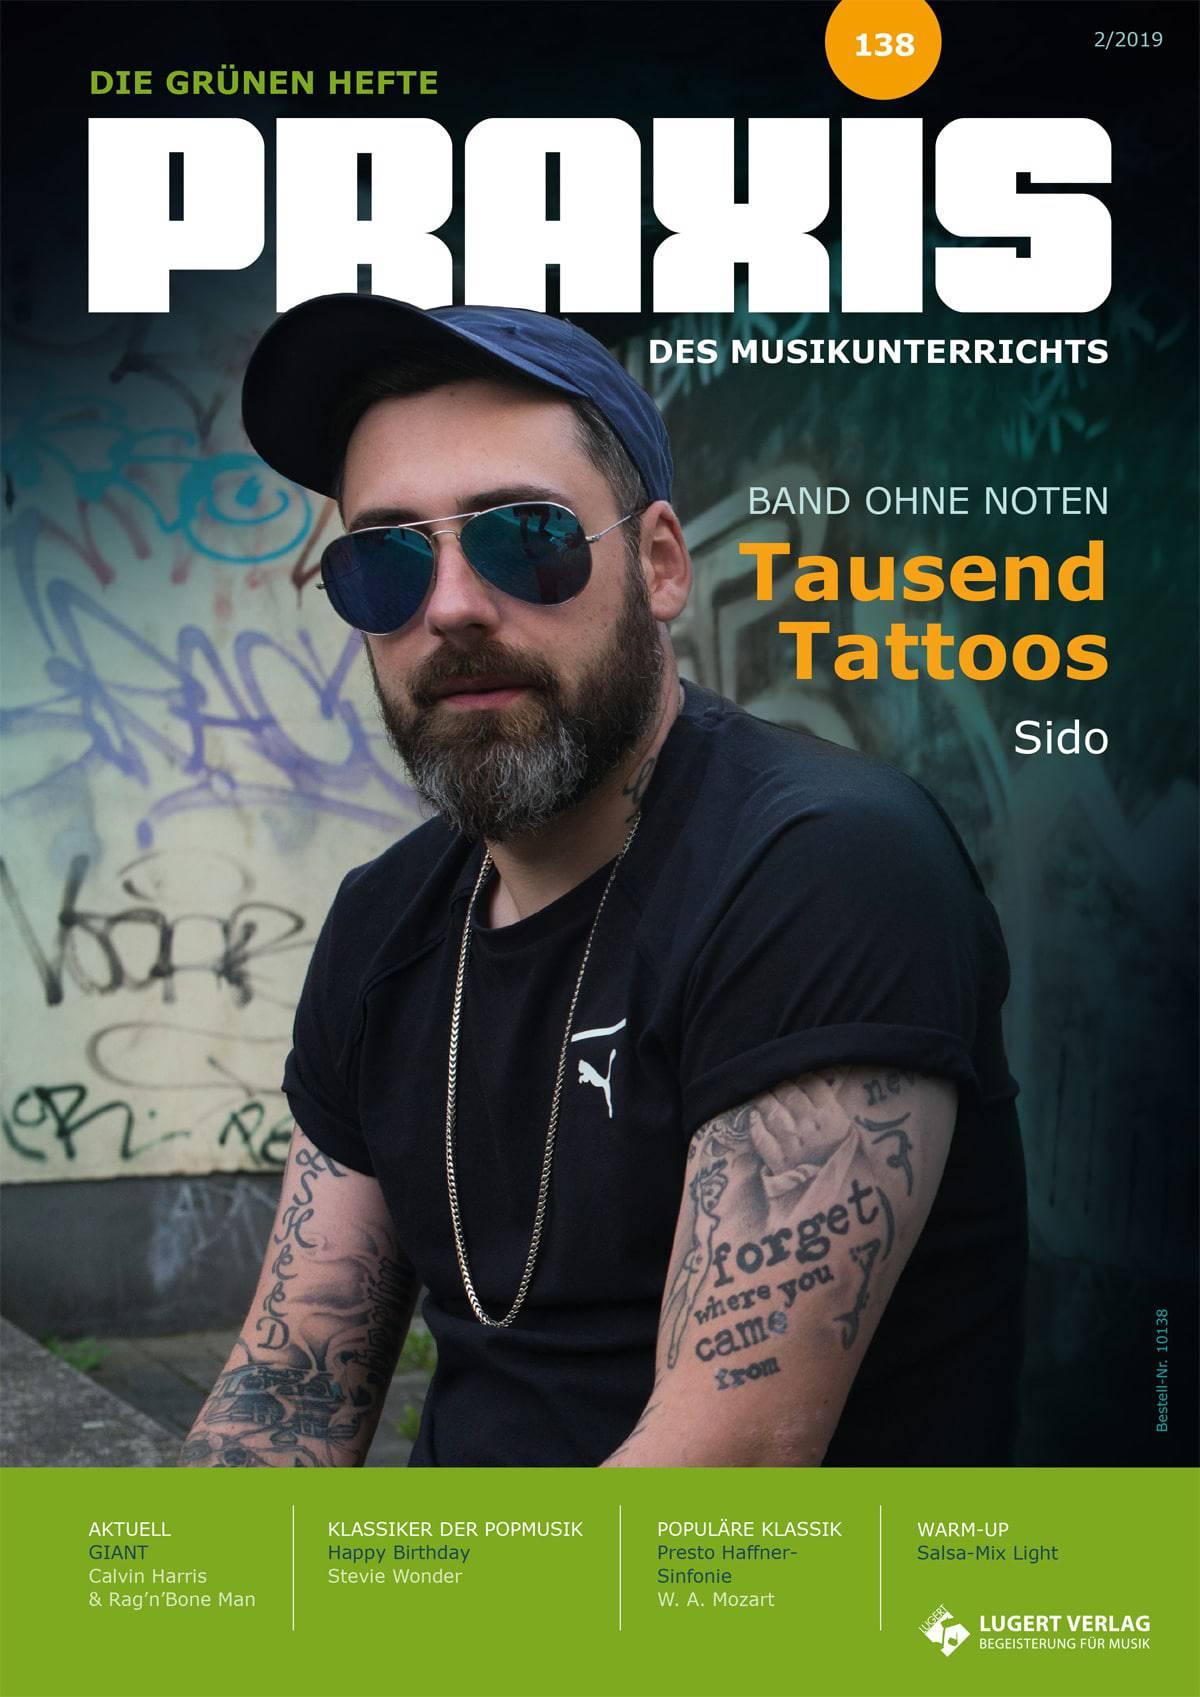 tausend tattoos noten sido